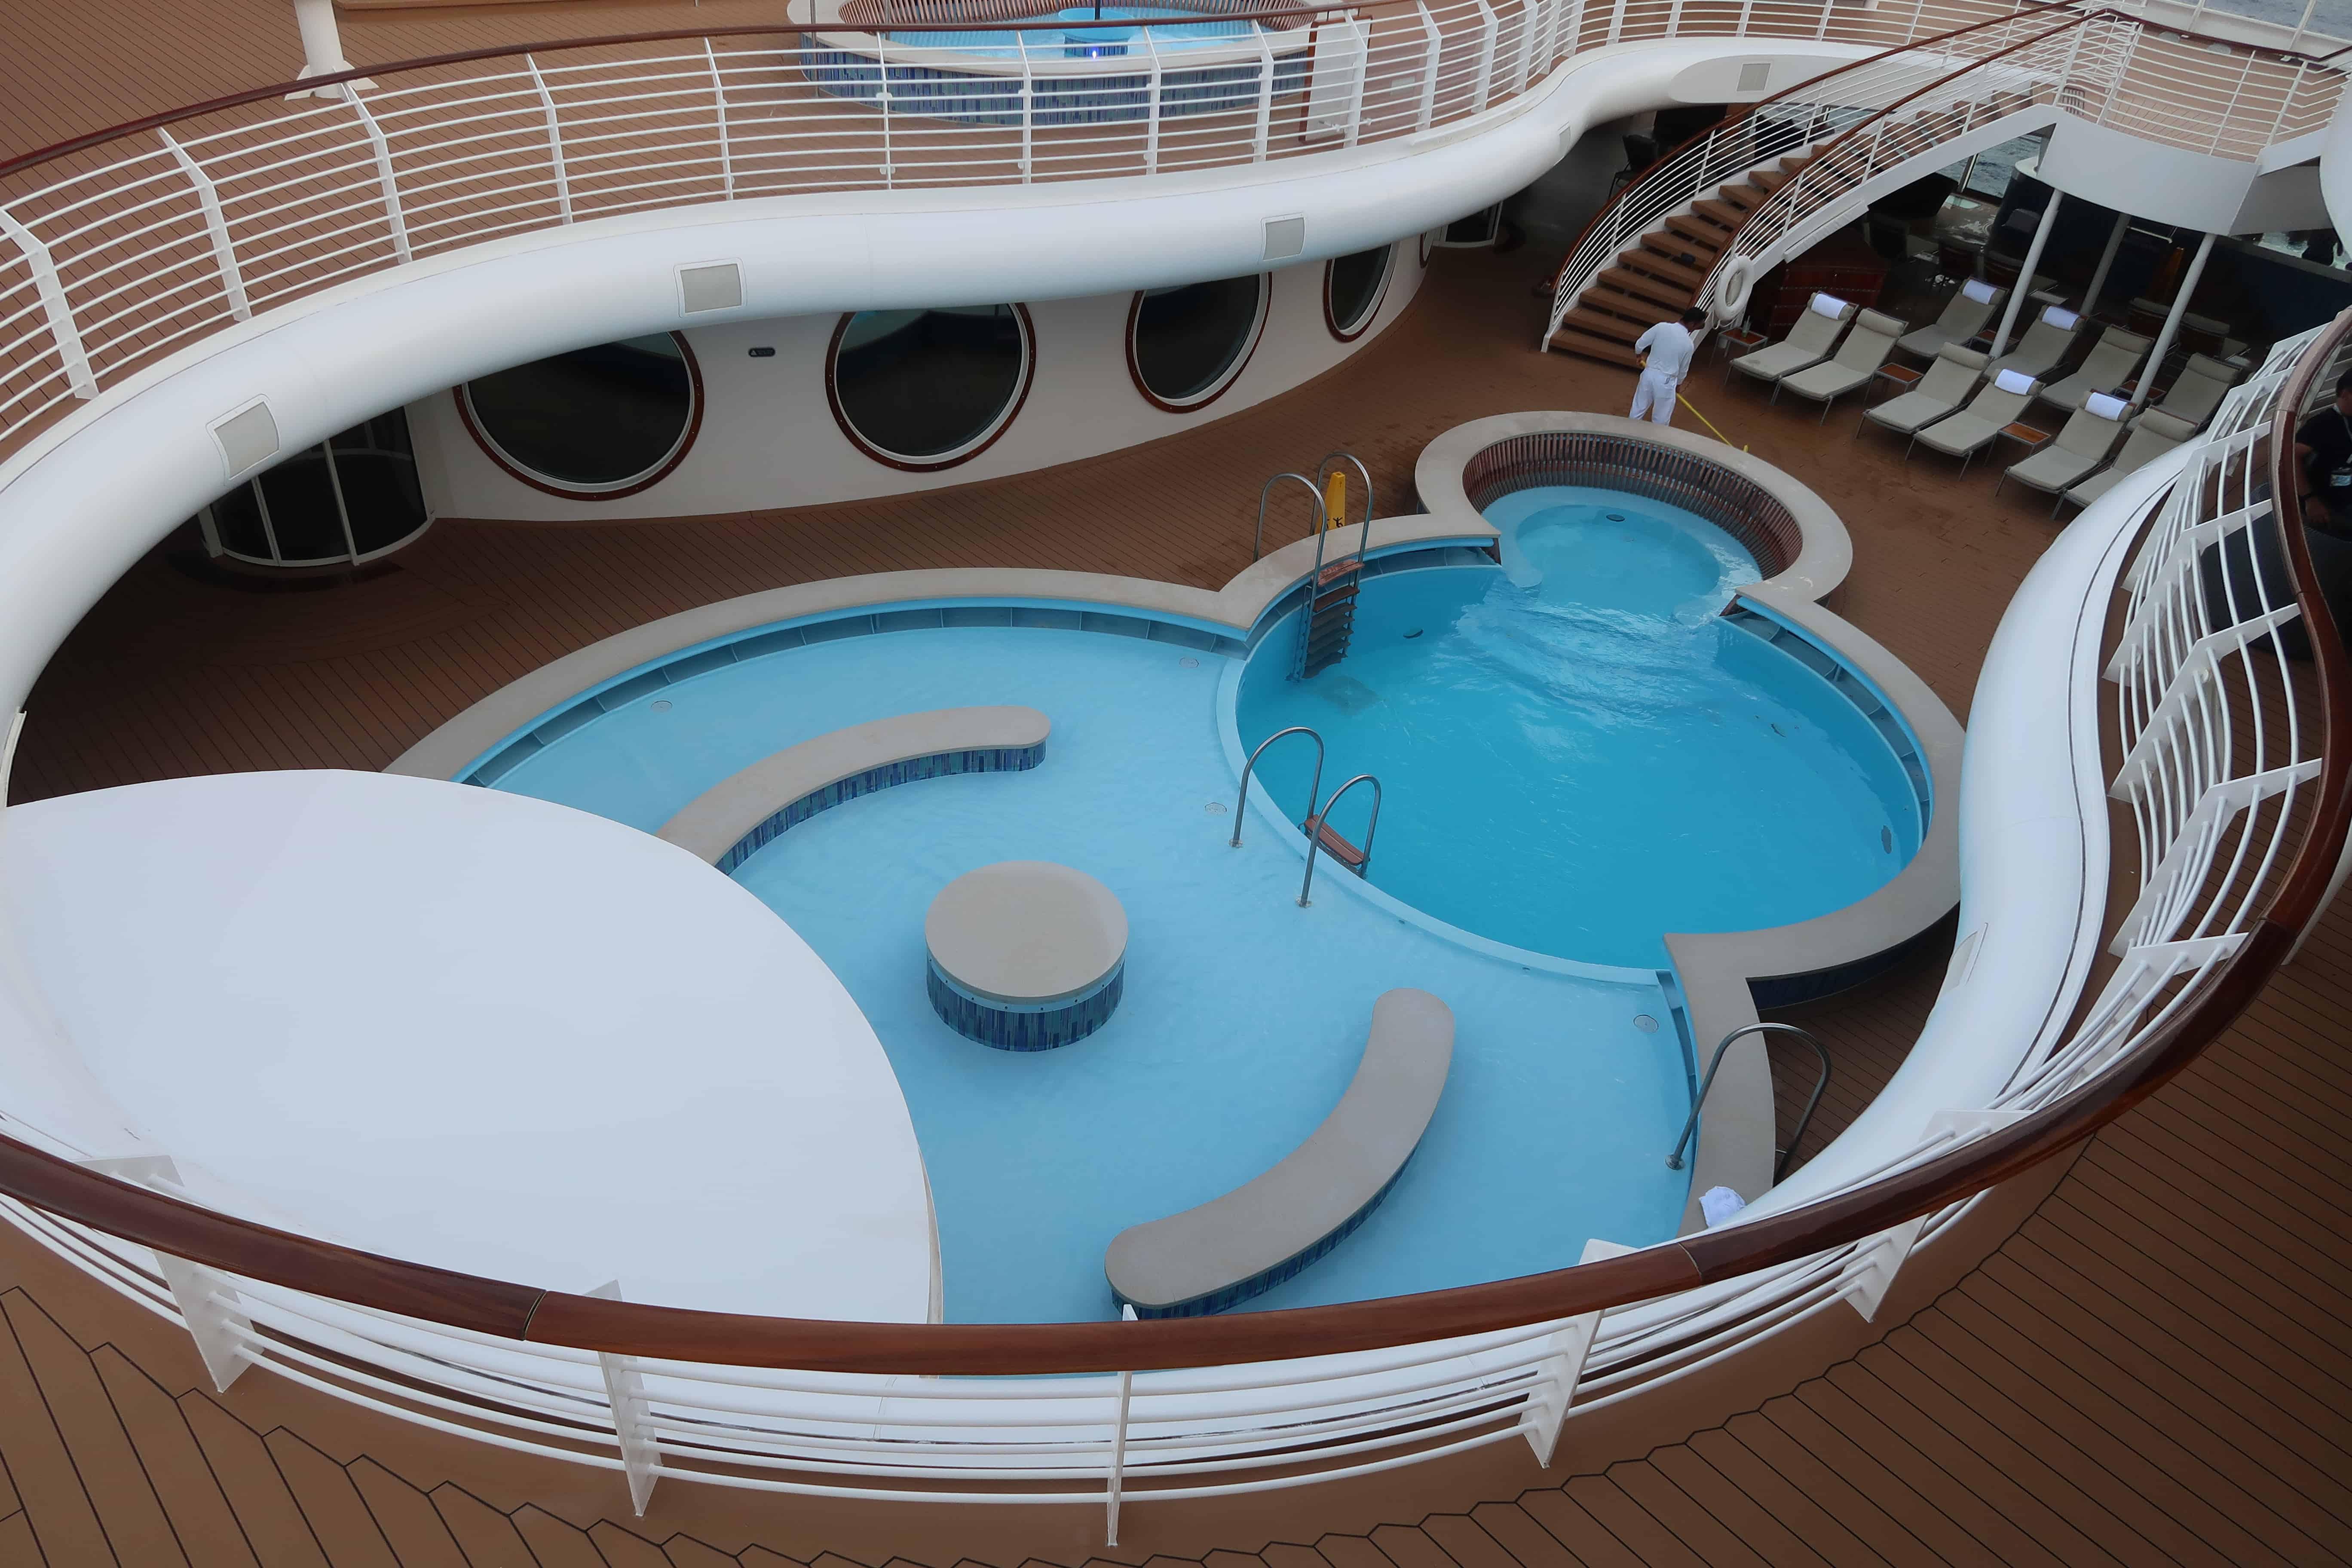 disney cruise swimming pool